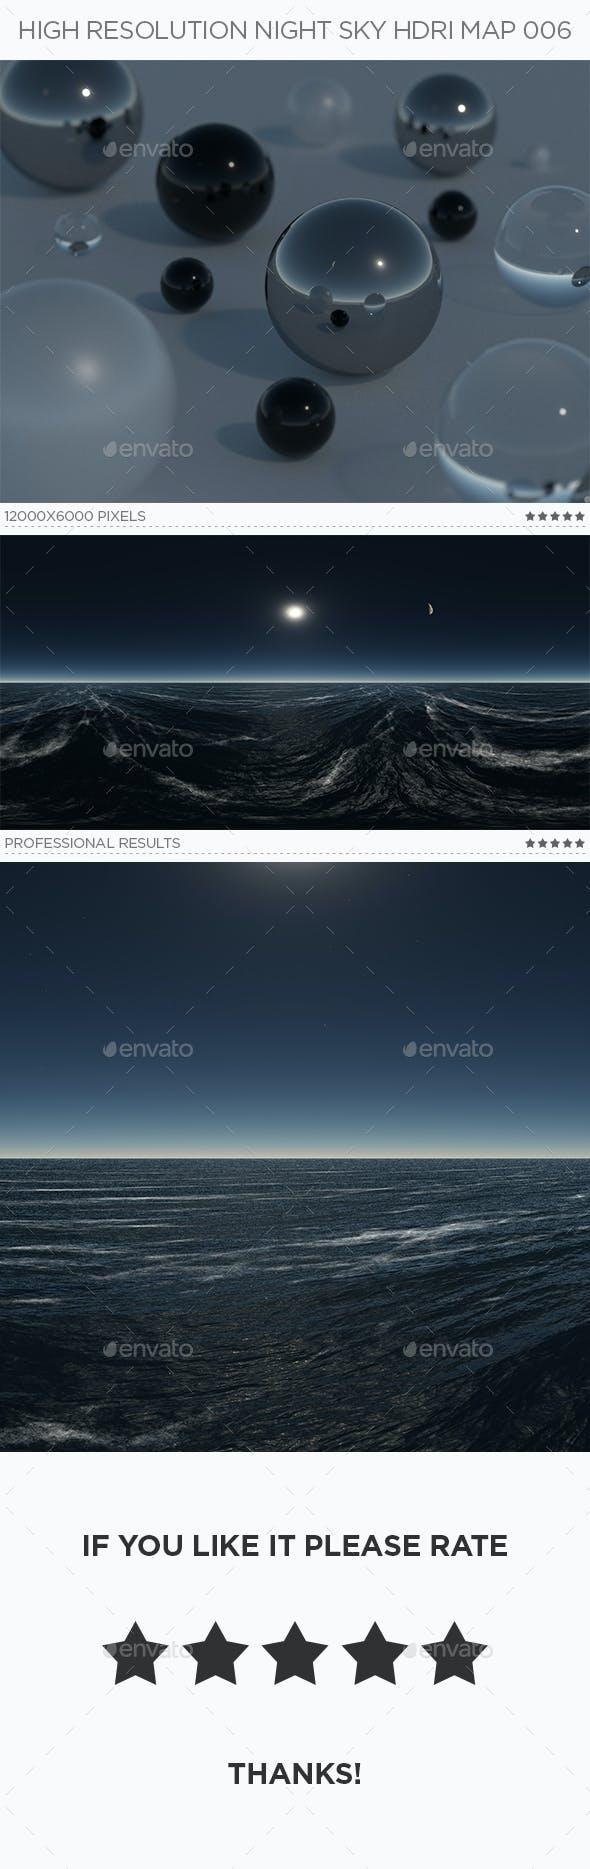 High Resolution Night Sky HDRi Map 006 - 3DOcean Item for Sale